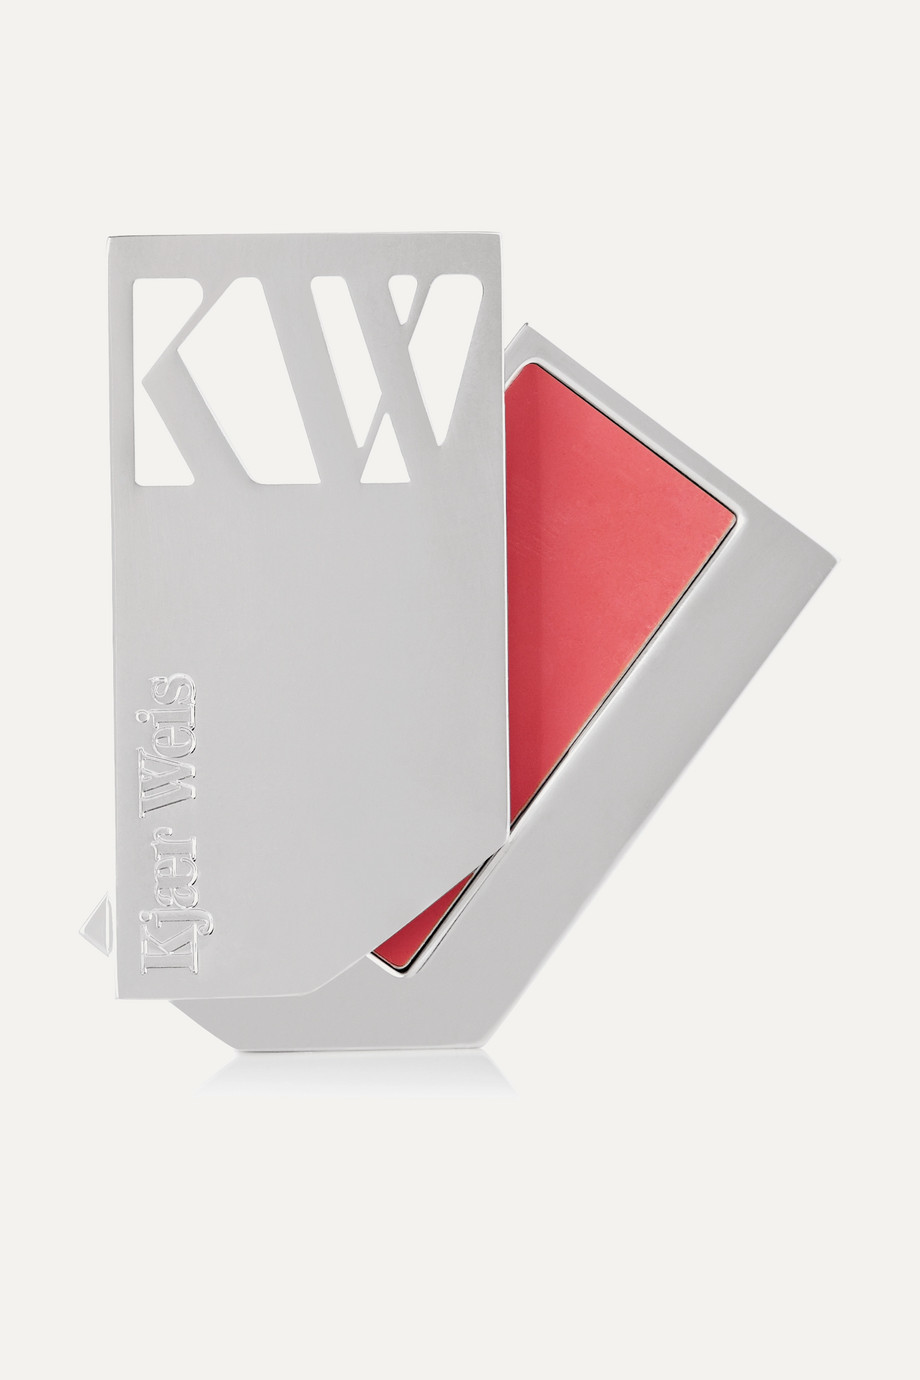 Kjaer Weis Lip Tint - Passionate